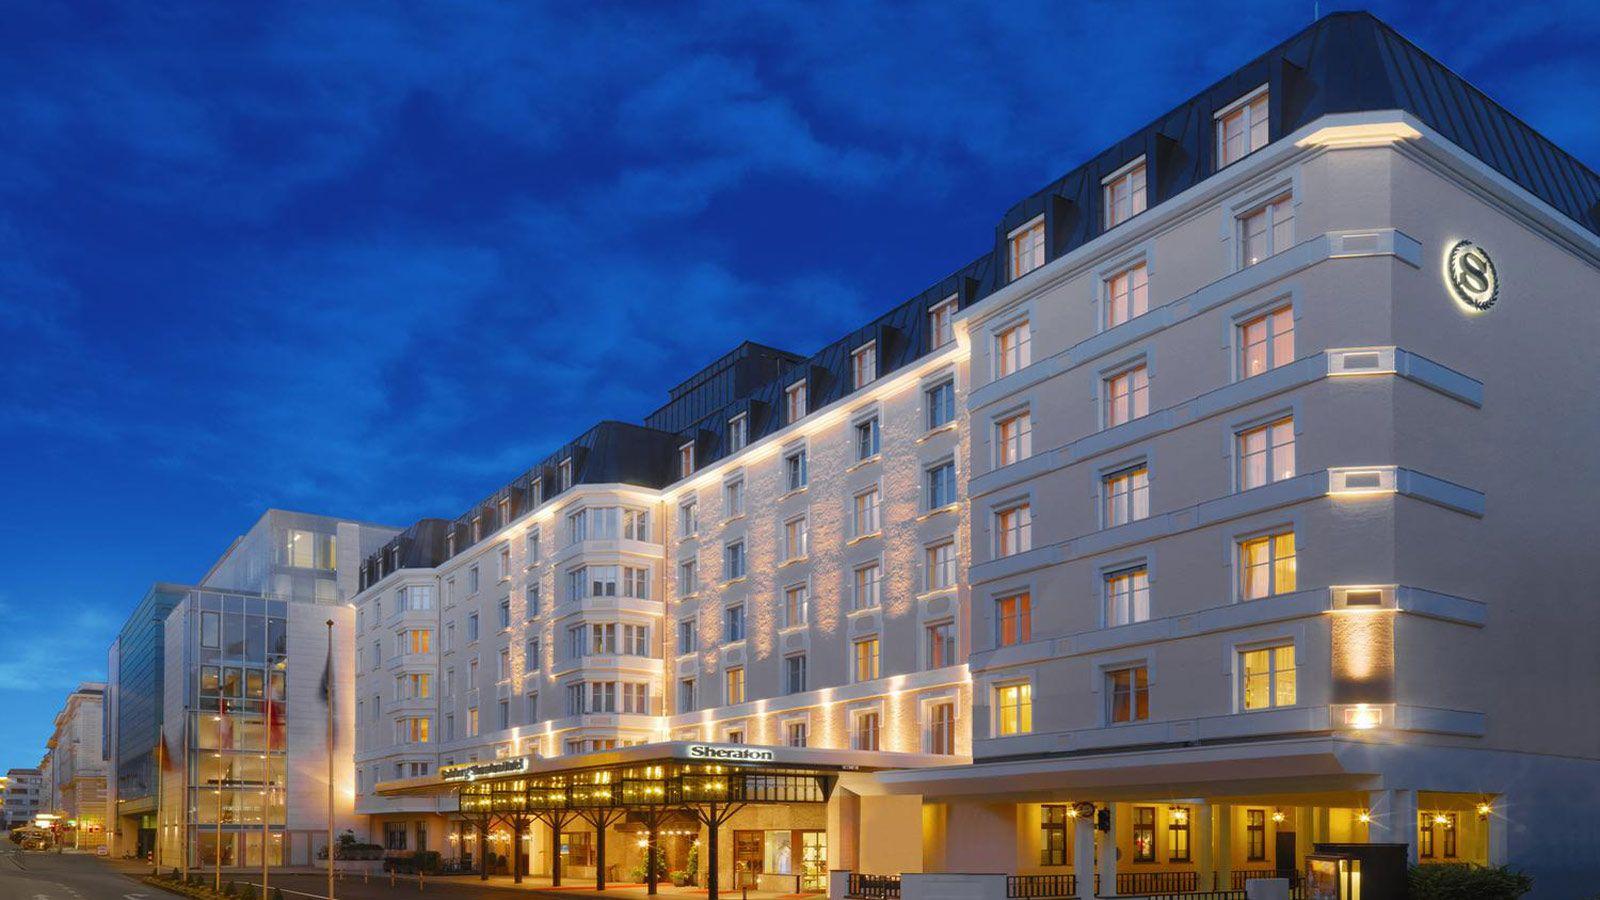 Sheraton grand salzburg debuts in austria kongres for New design hotels 2016